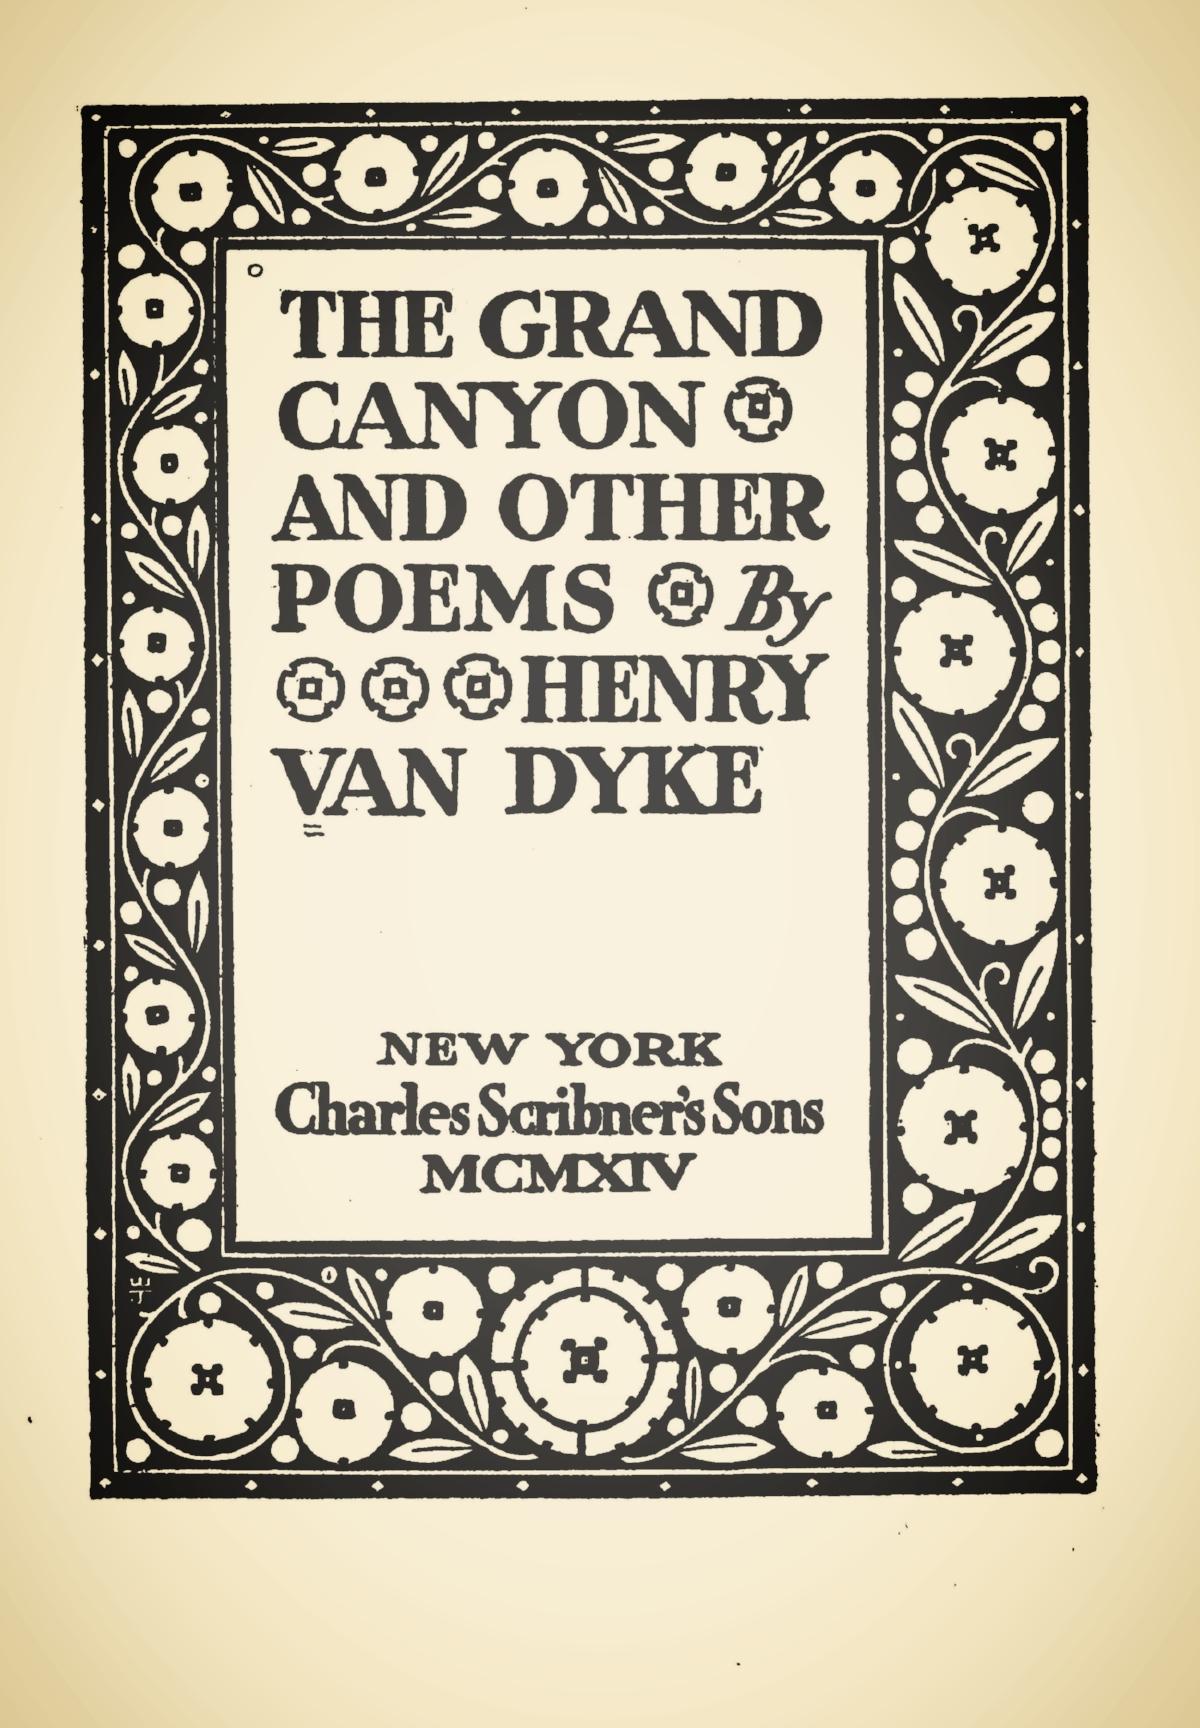 Van Dyke, Jr., Henry Jackson, The Grand Canyon Title Page.jpg